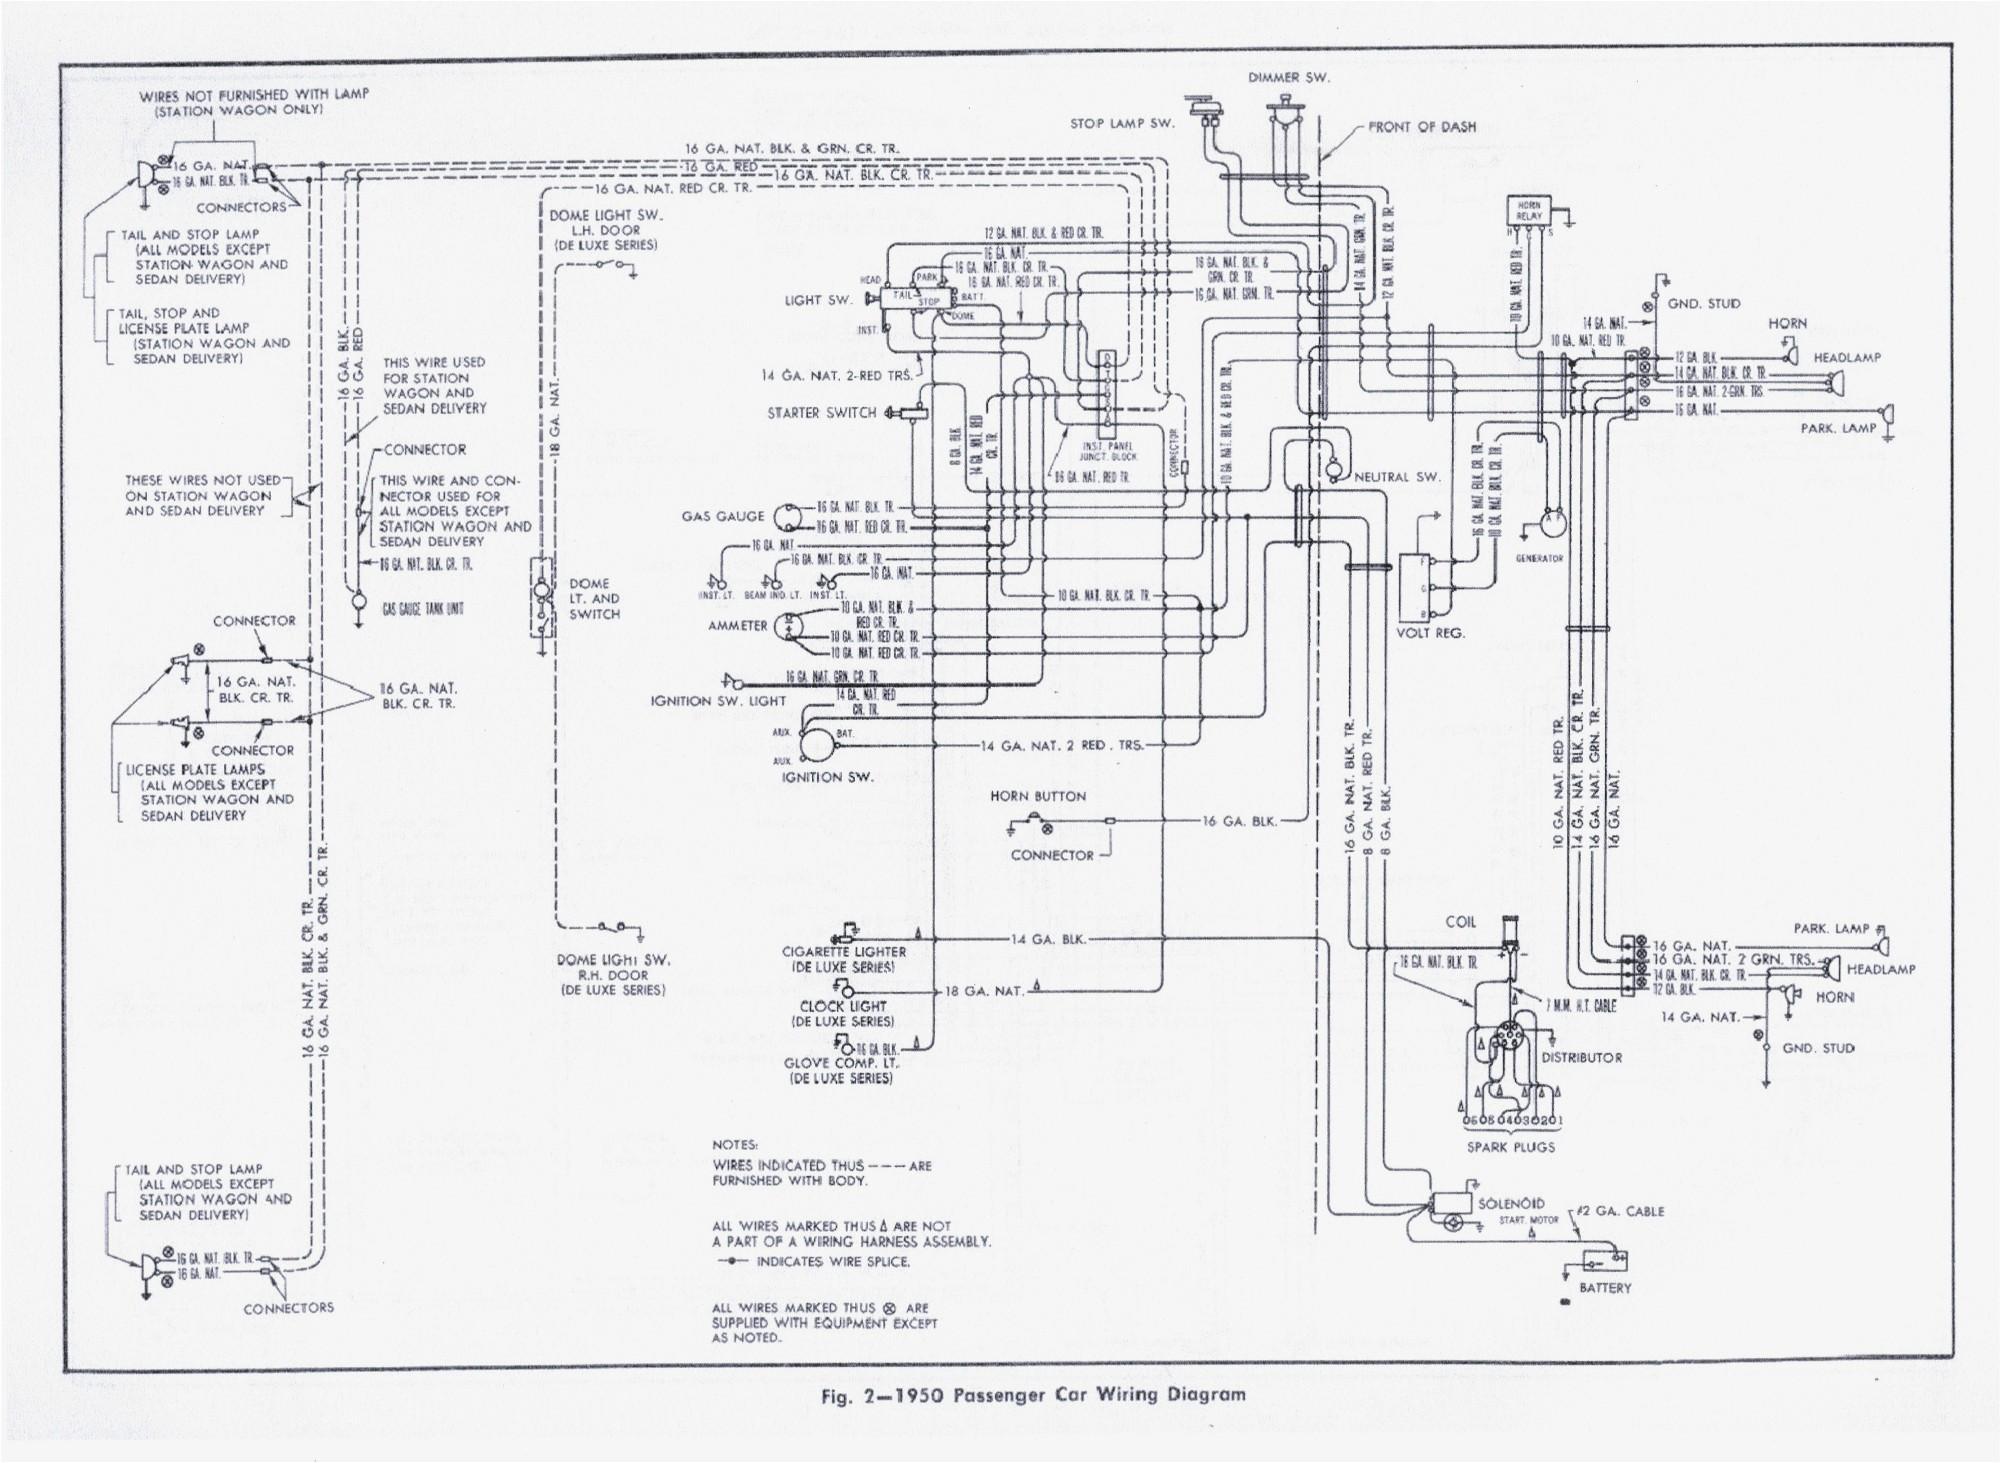 Fabulous 1950 Chevrolet Wiring Diagram Wiring Cloud Xortanetembamohammedshrineorg